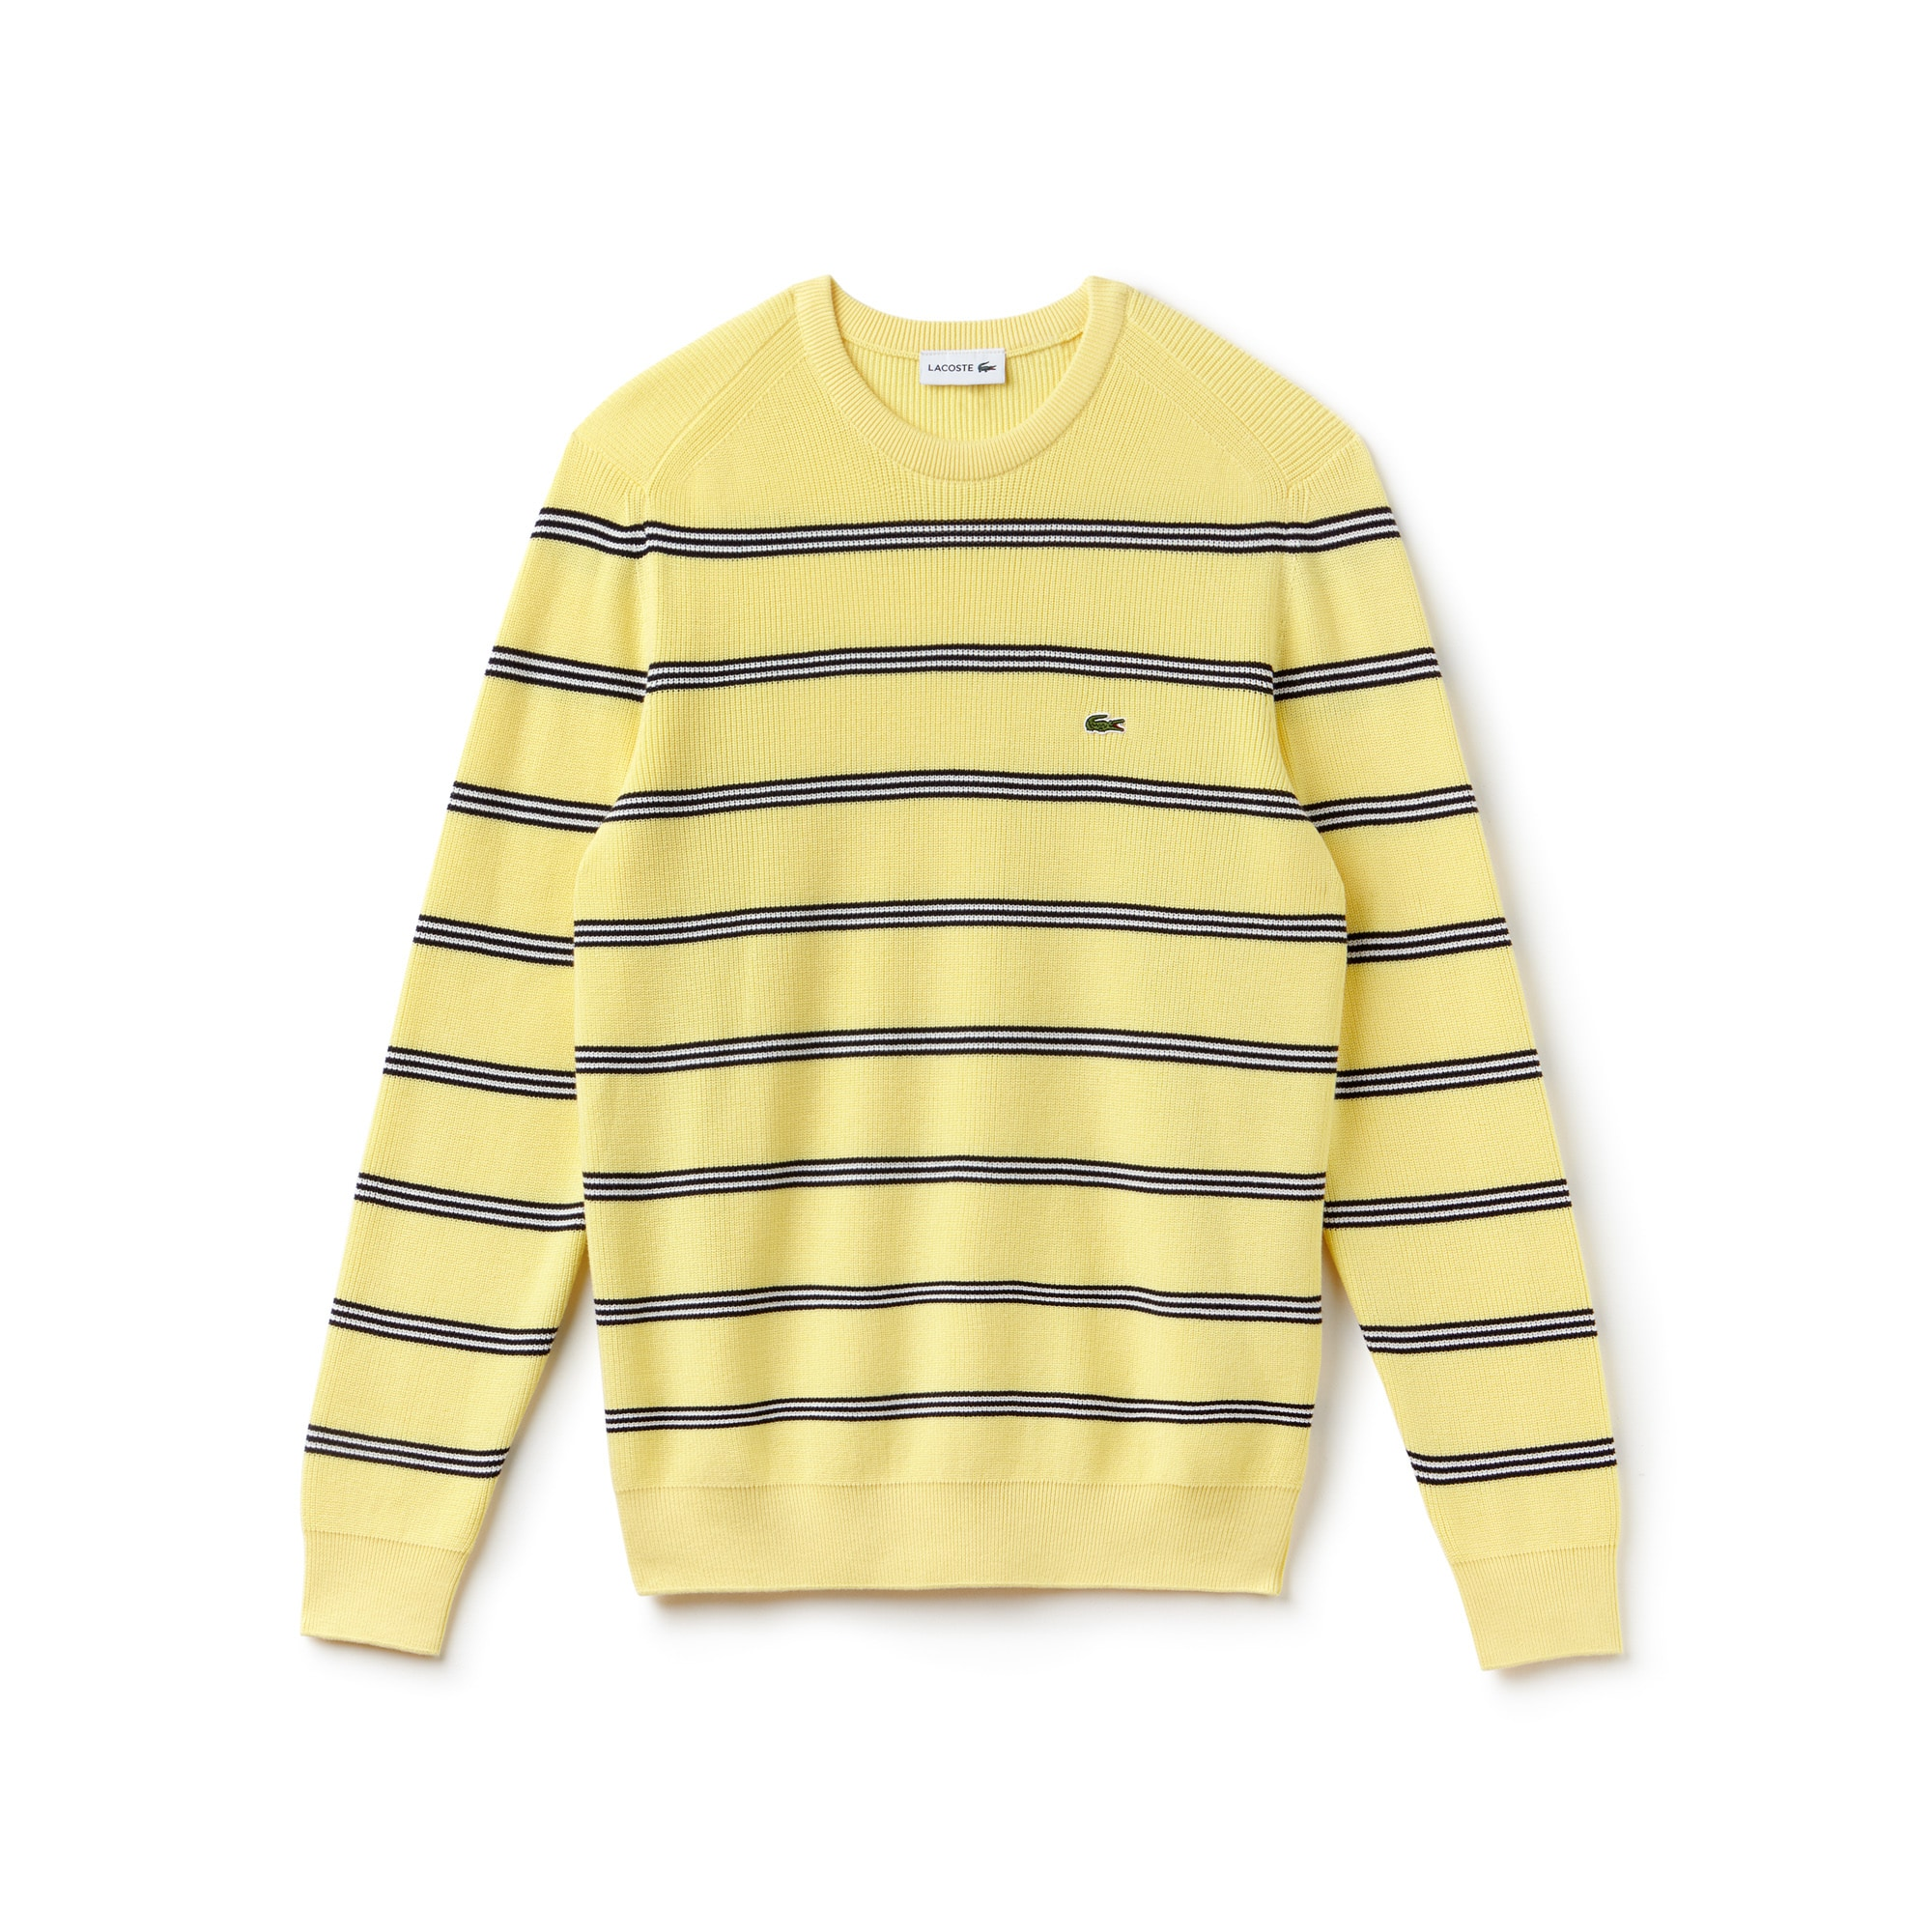 Men's Crew Neck Striped Ribbed Sweater